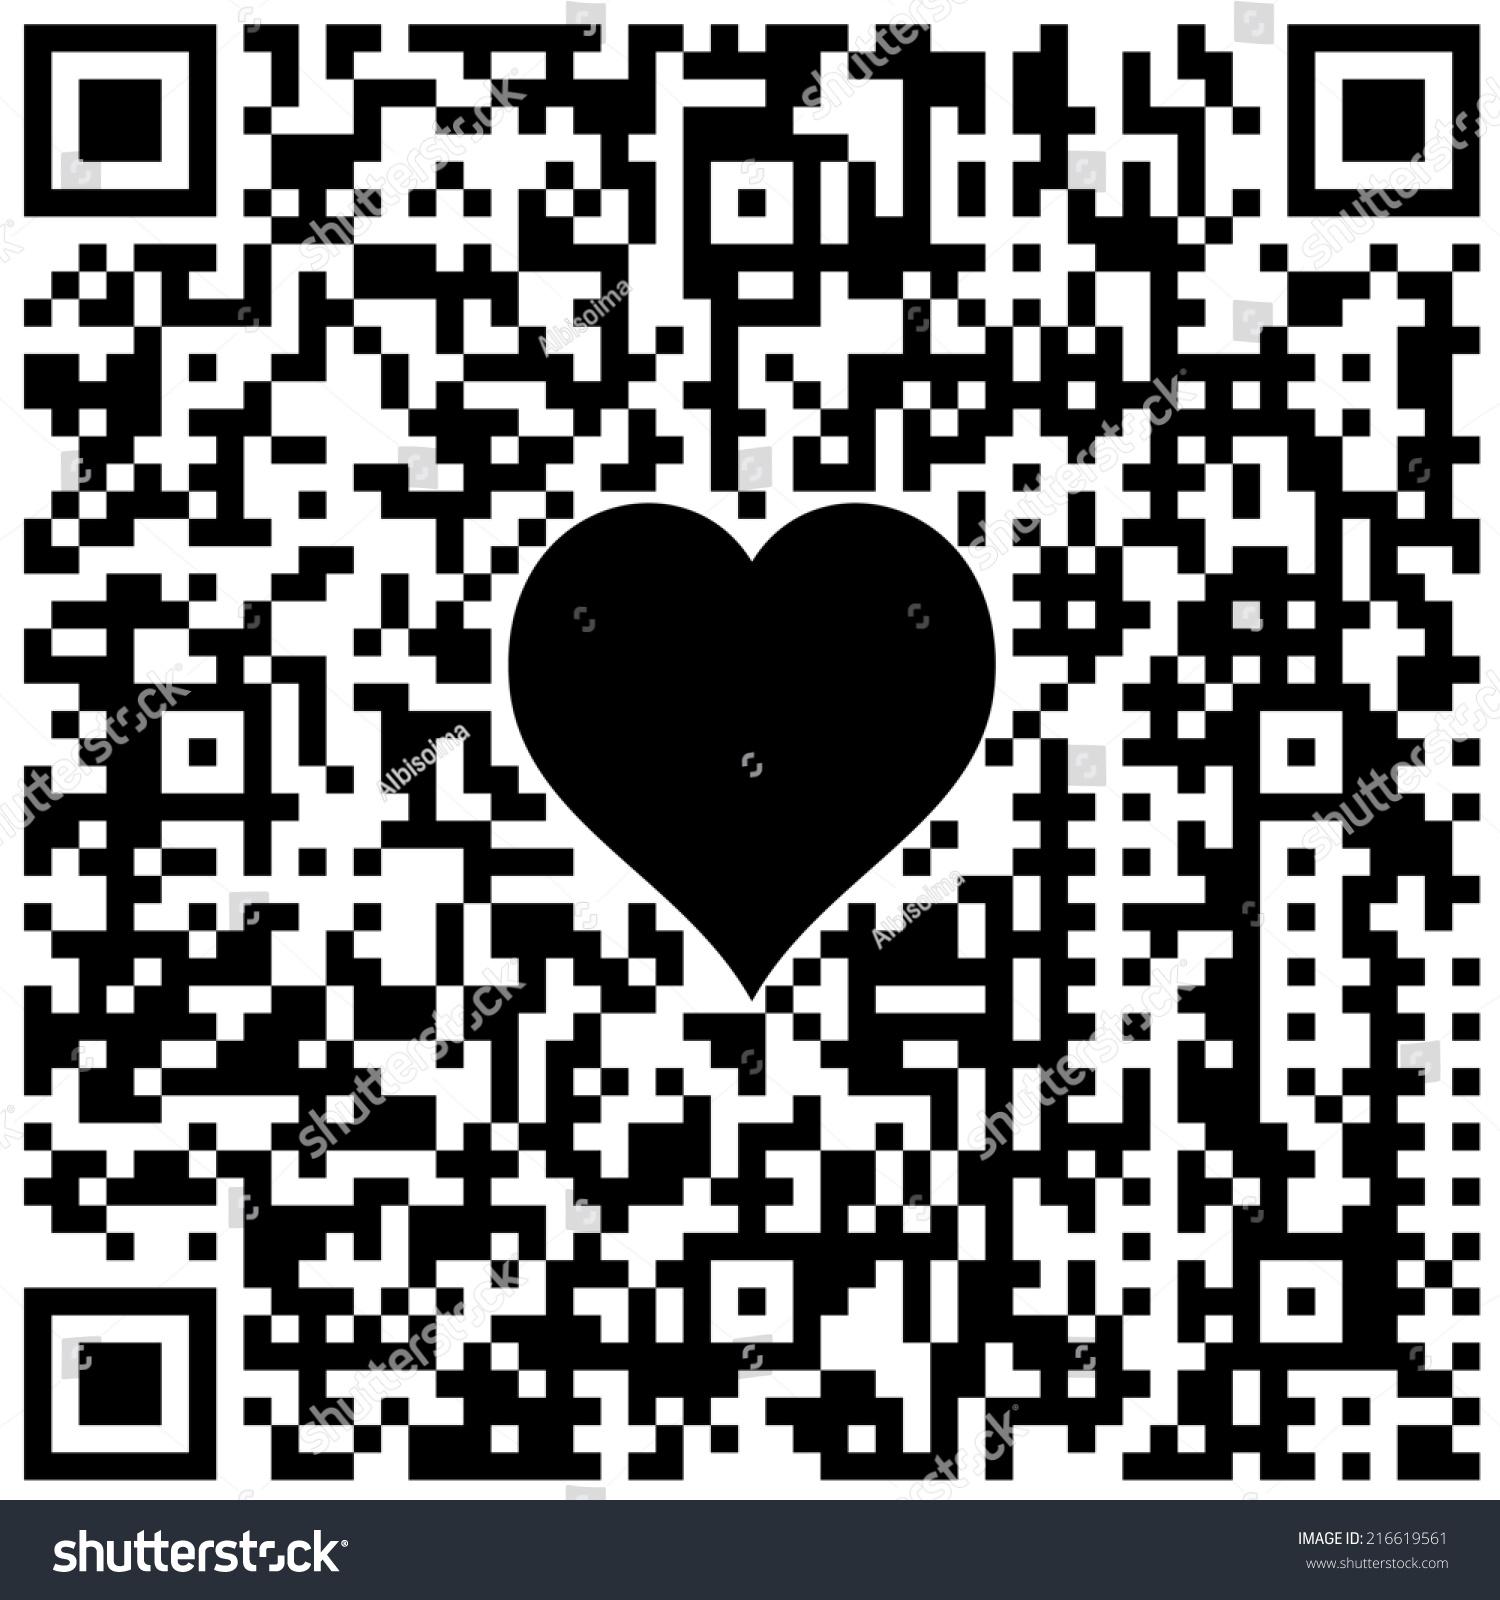 Qr code symbol heart hidden text stock illustration 216619561 qr code with symbol of heart and hidden text i love buycottarizona Choice Image